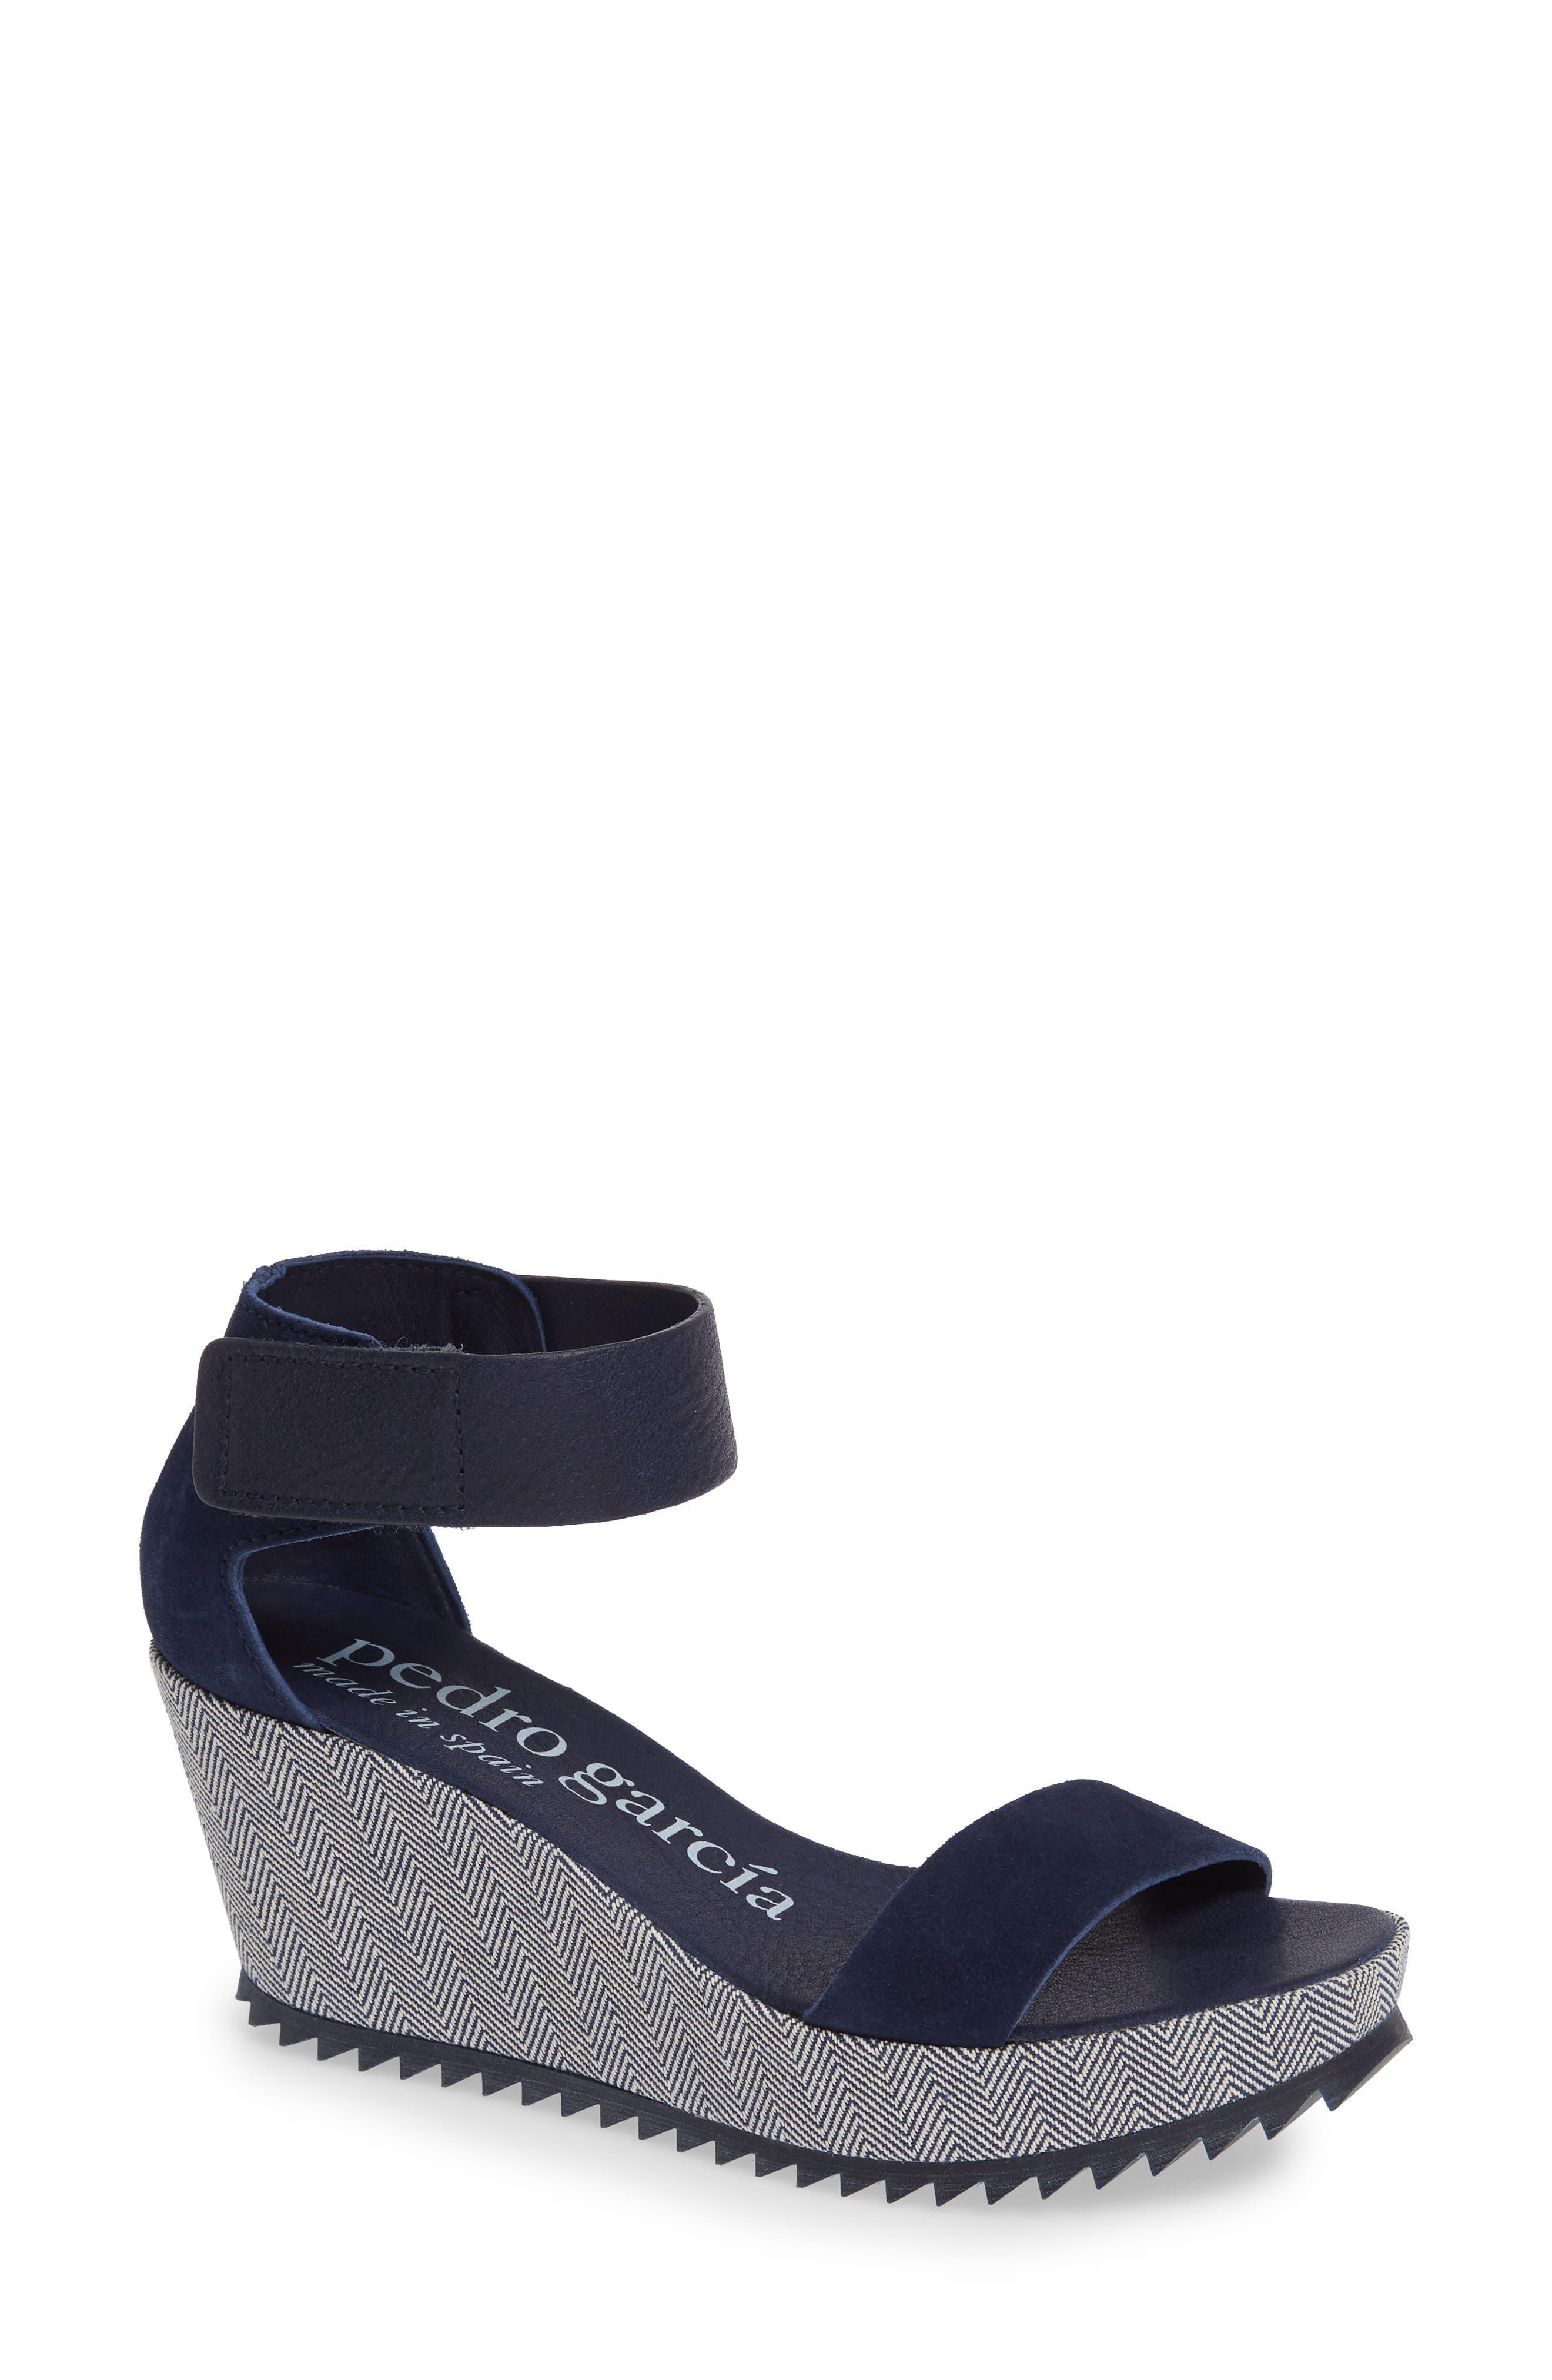 28f5cb27ff4 Pedro Garcia Women s Sandals Shoes